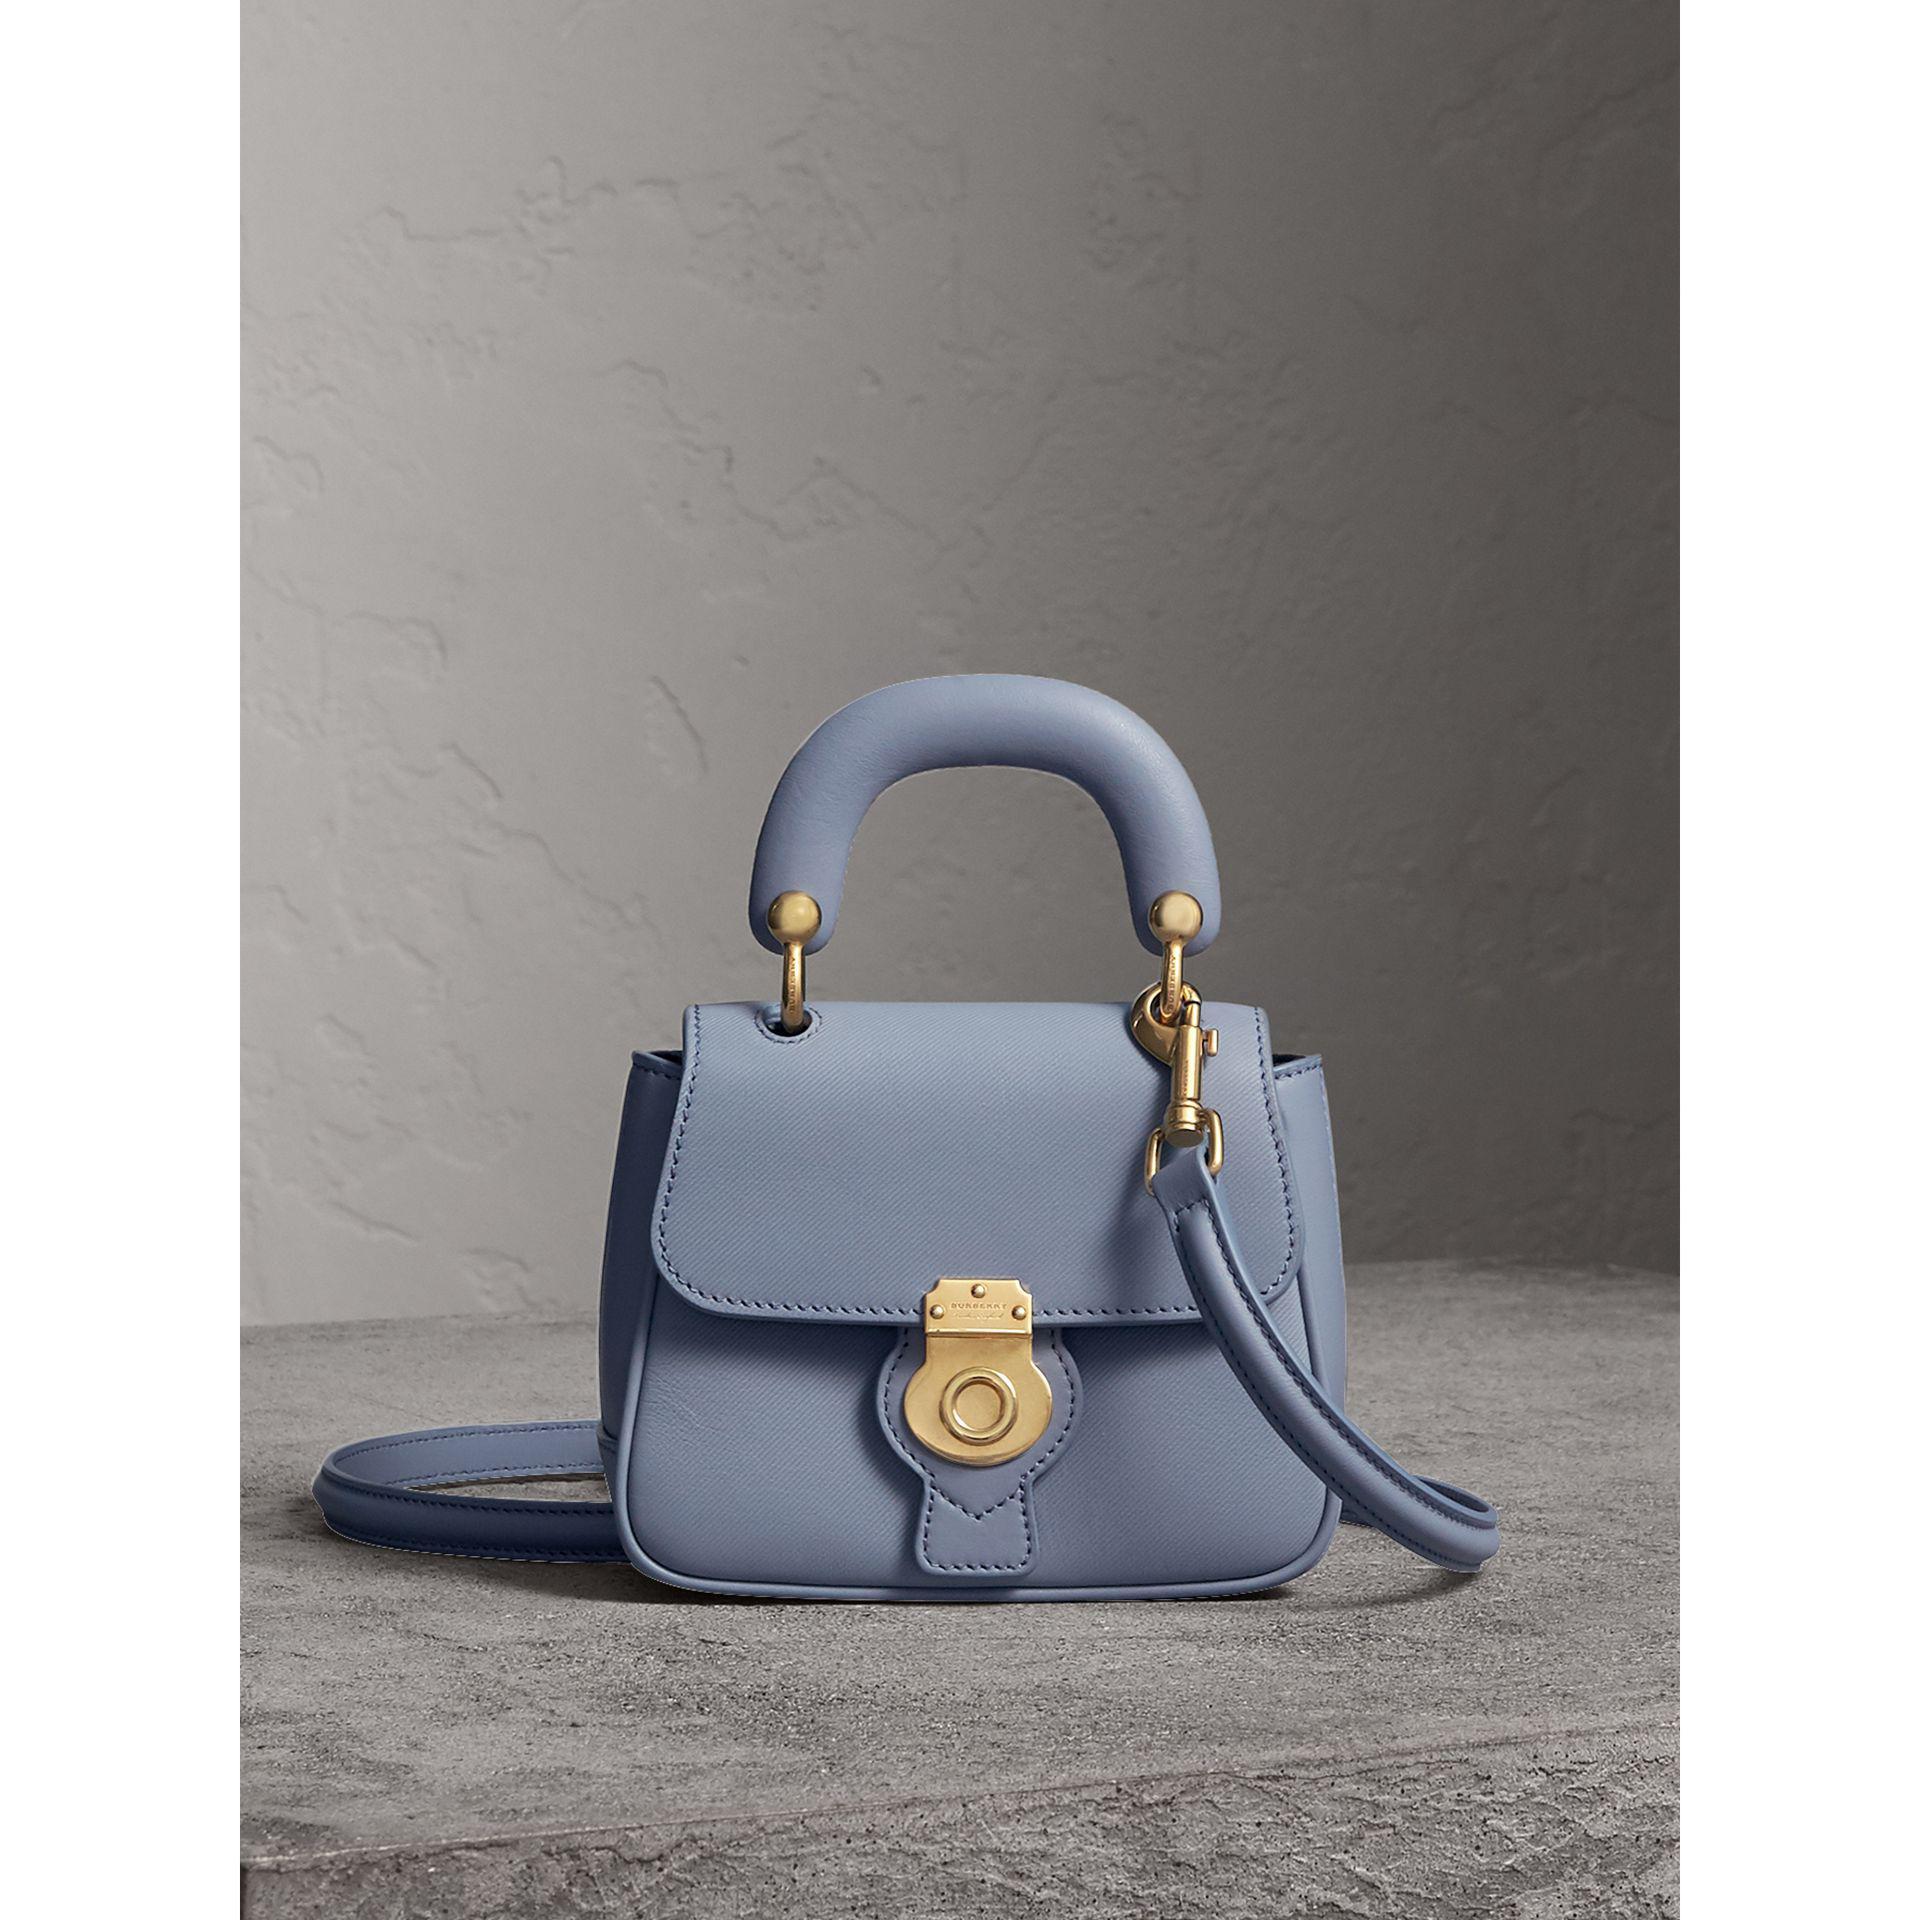 b69e3572e69e Lyst - Burberry The Mini Dk88 Top Handle Bag In Slate Blue